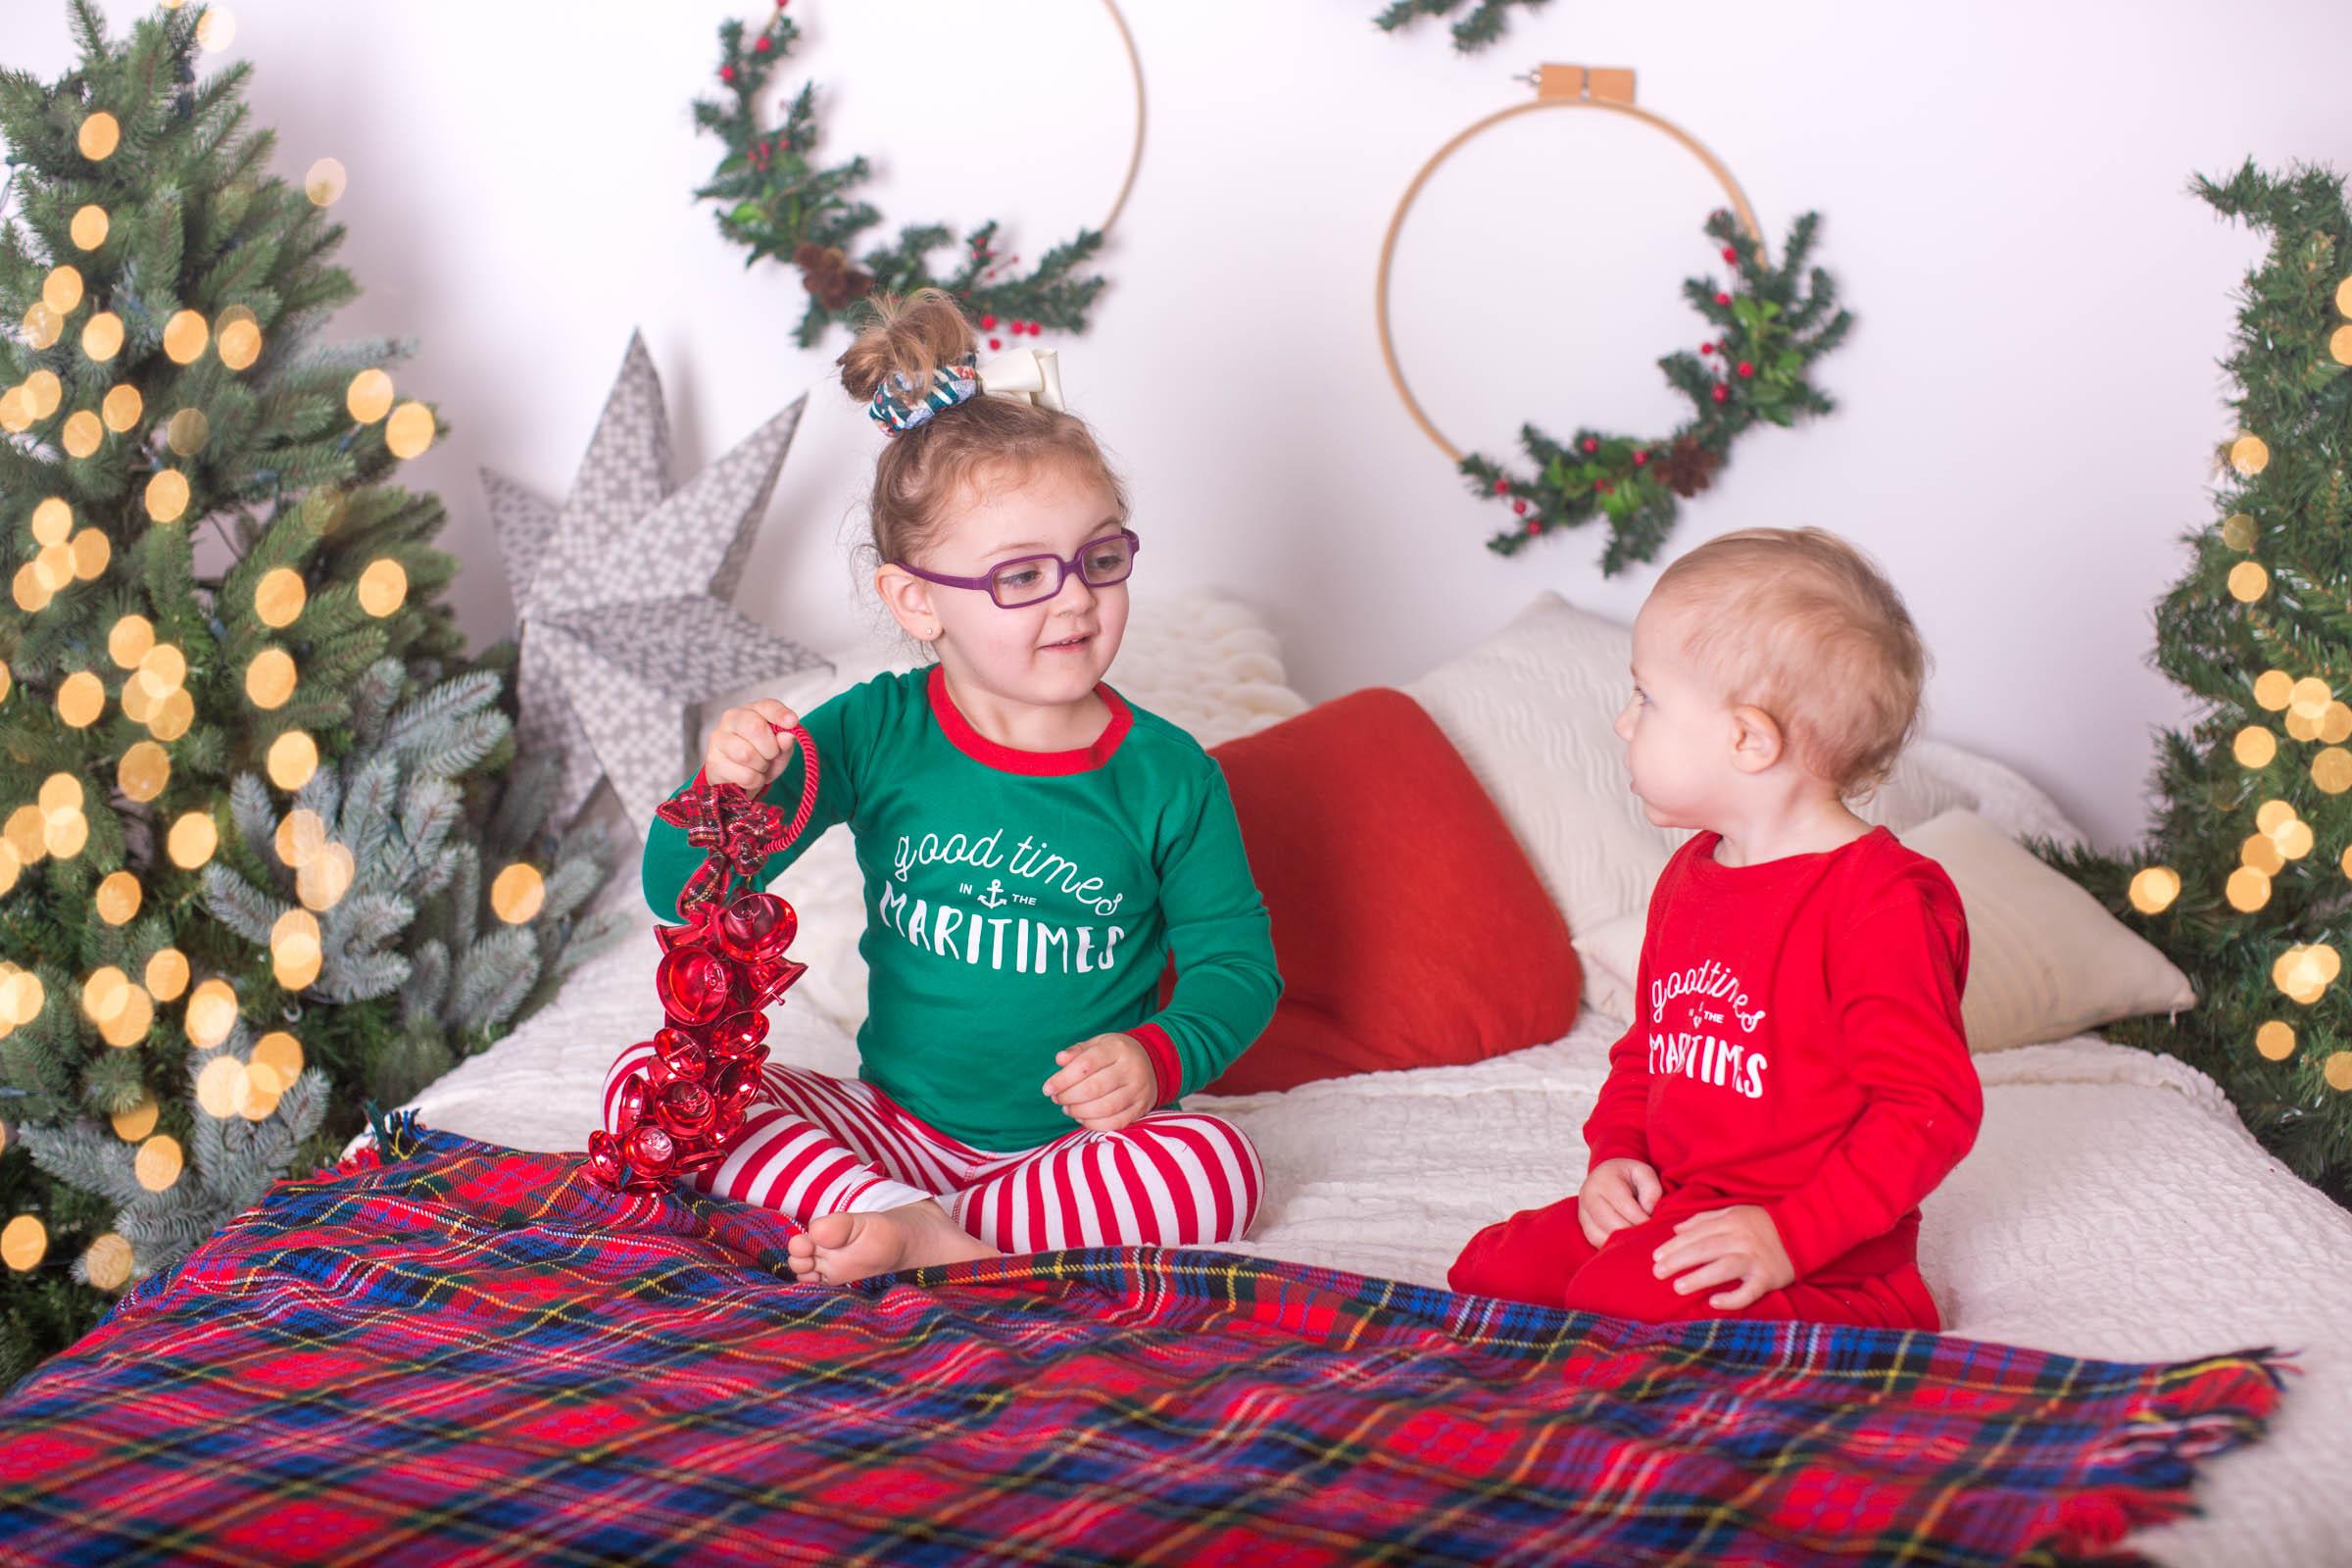 Image of 2 children dressed in Christmas pyjamas